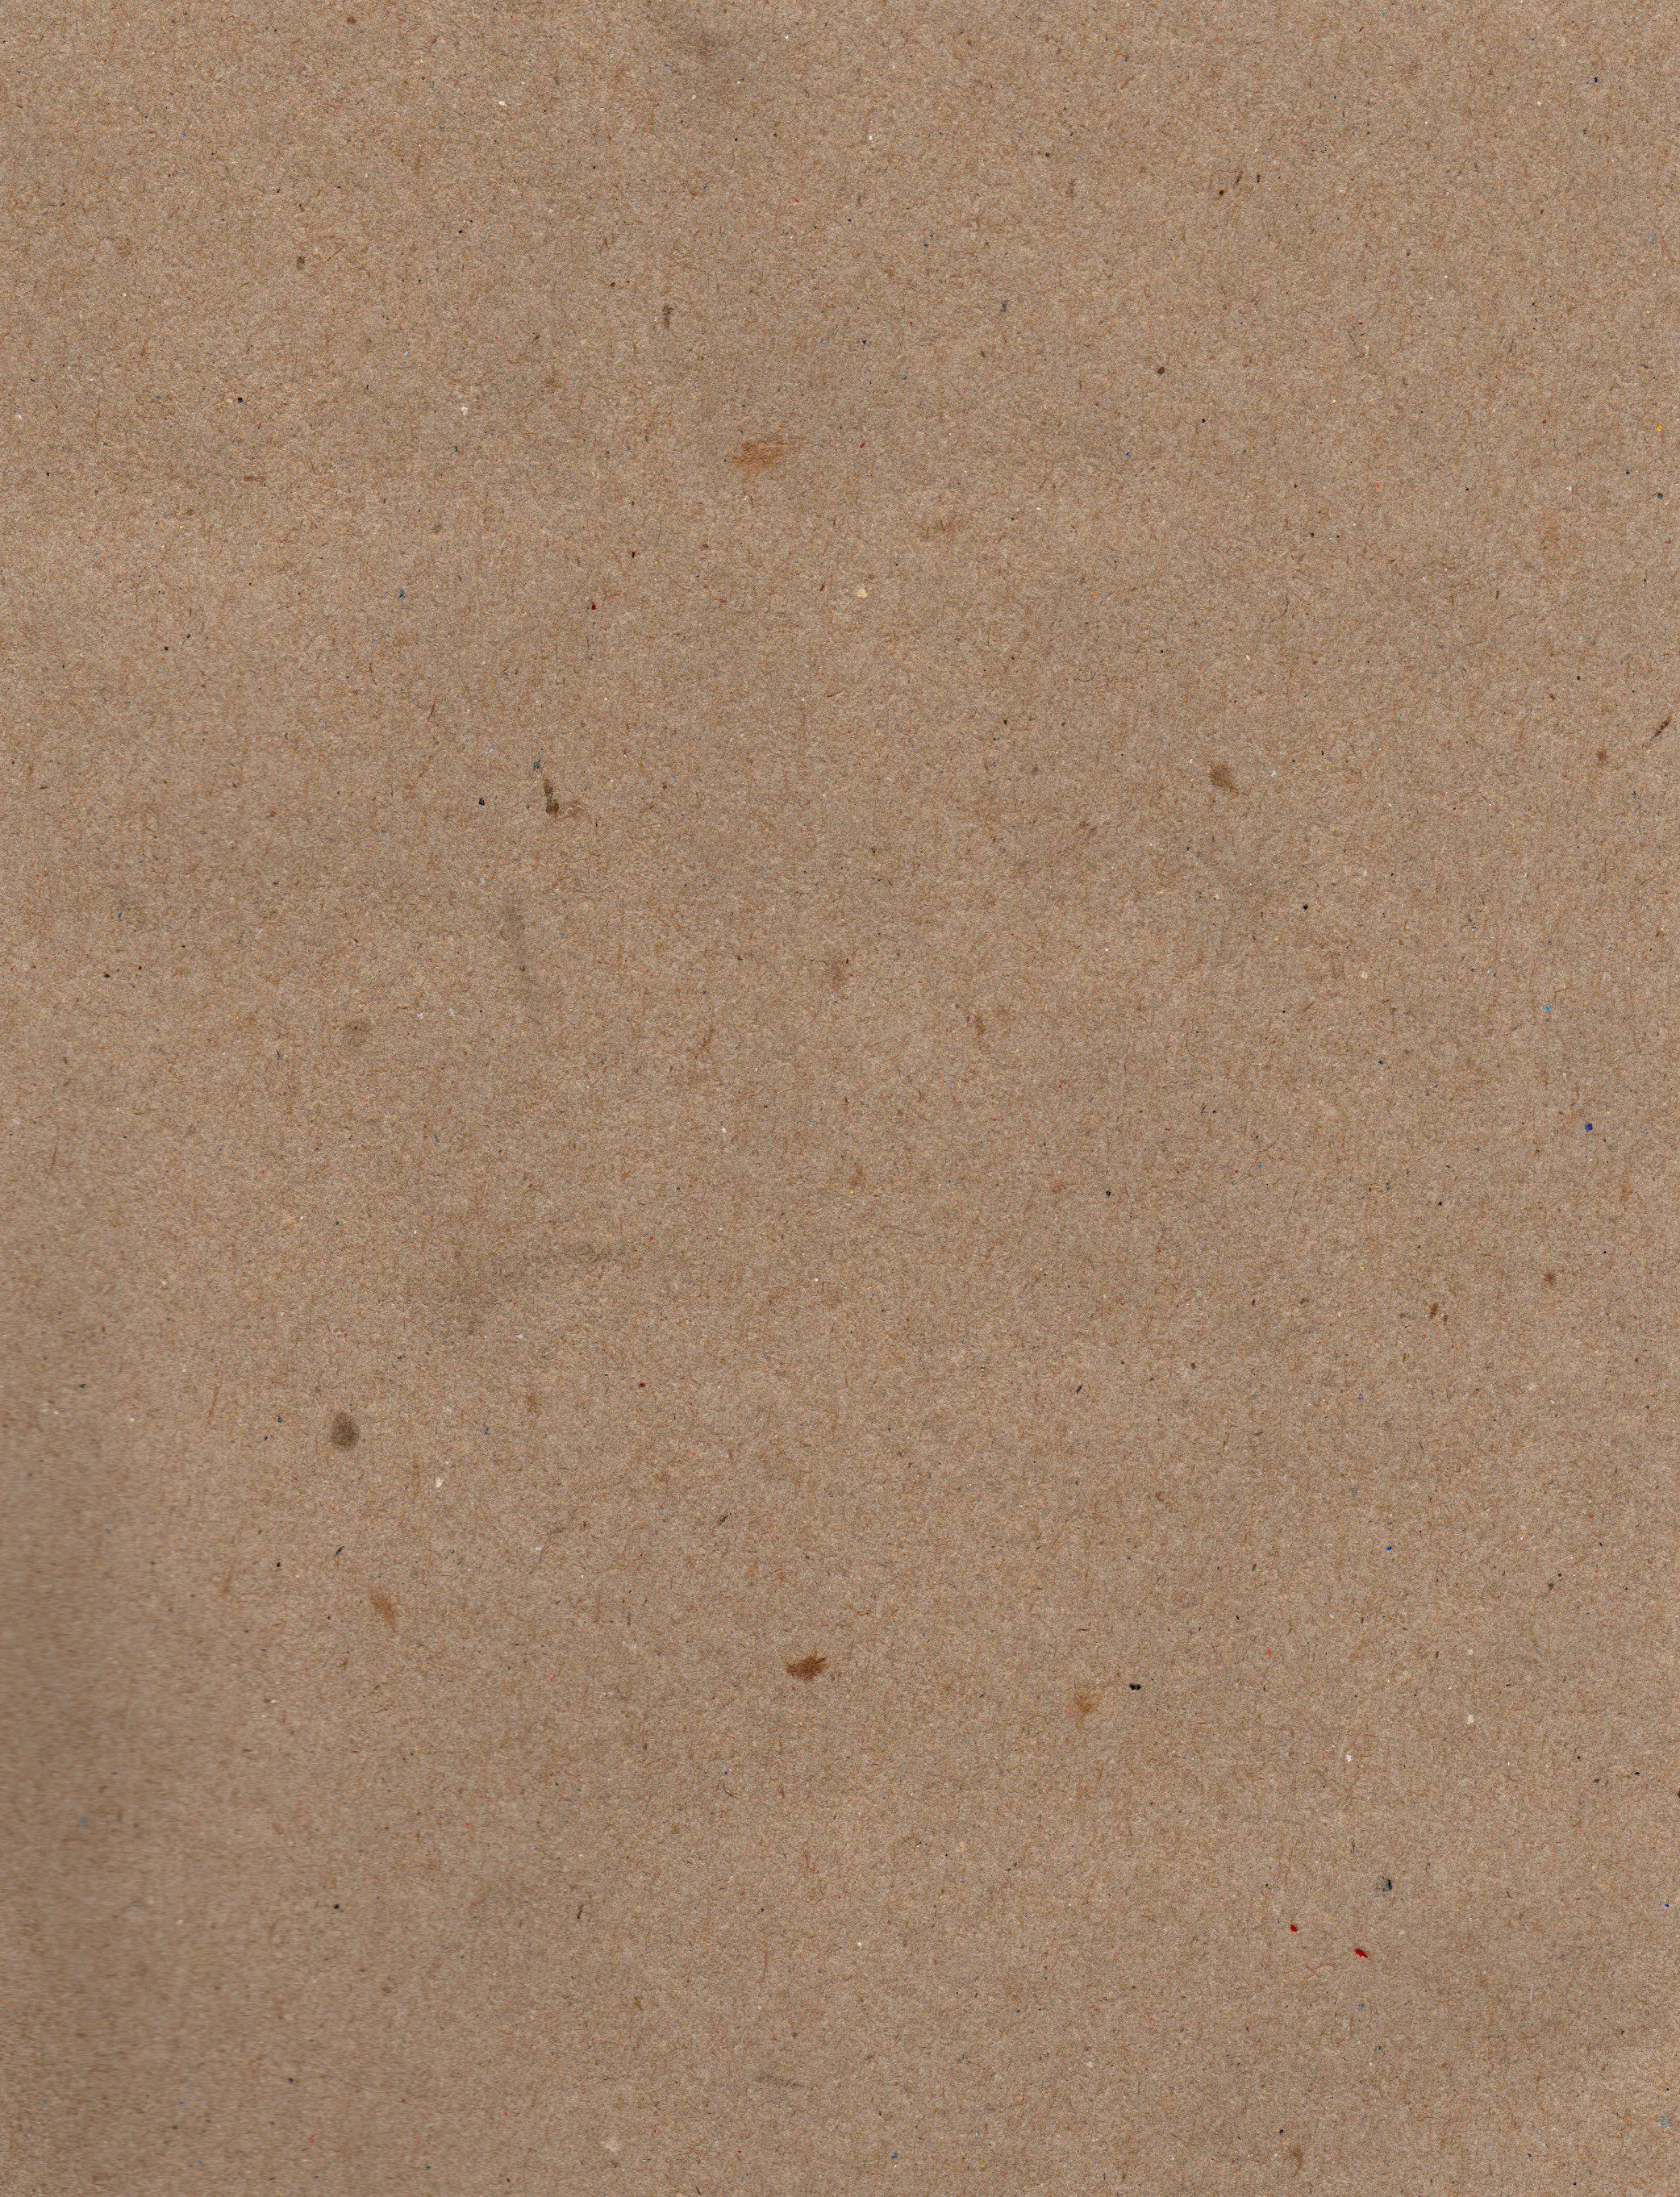 Brown Paper And Cardboard Texture Tekstura Bumagi Staraya Bumaga